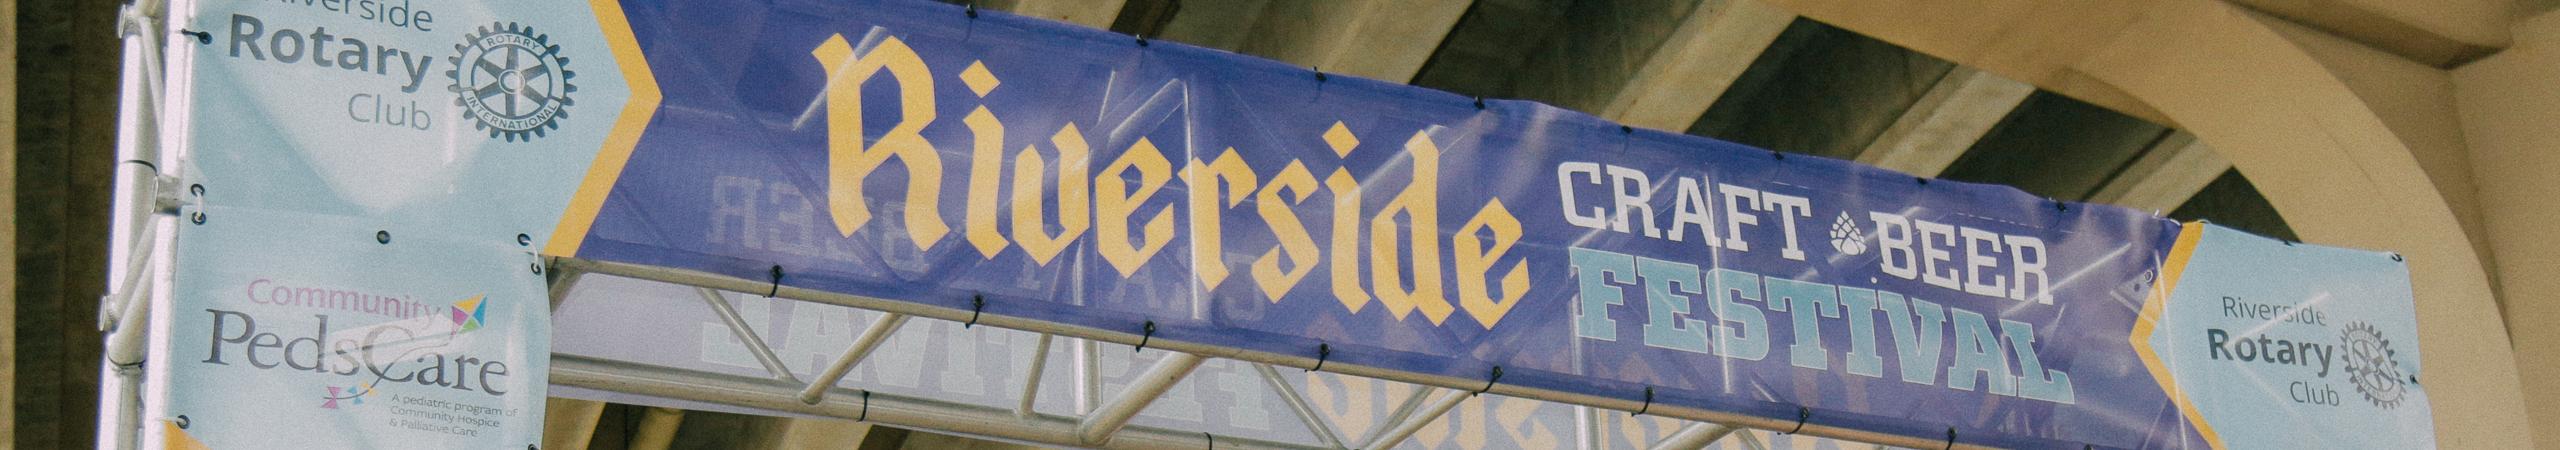 2019 Riverside Craft Beer Festival